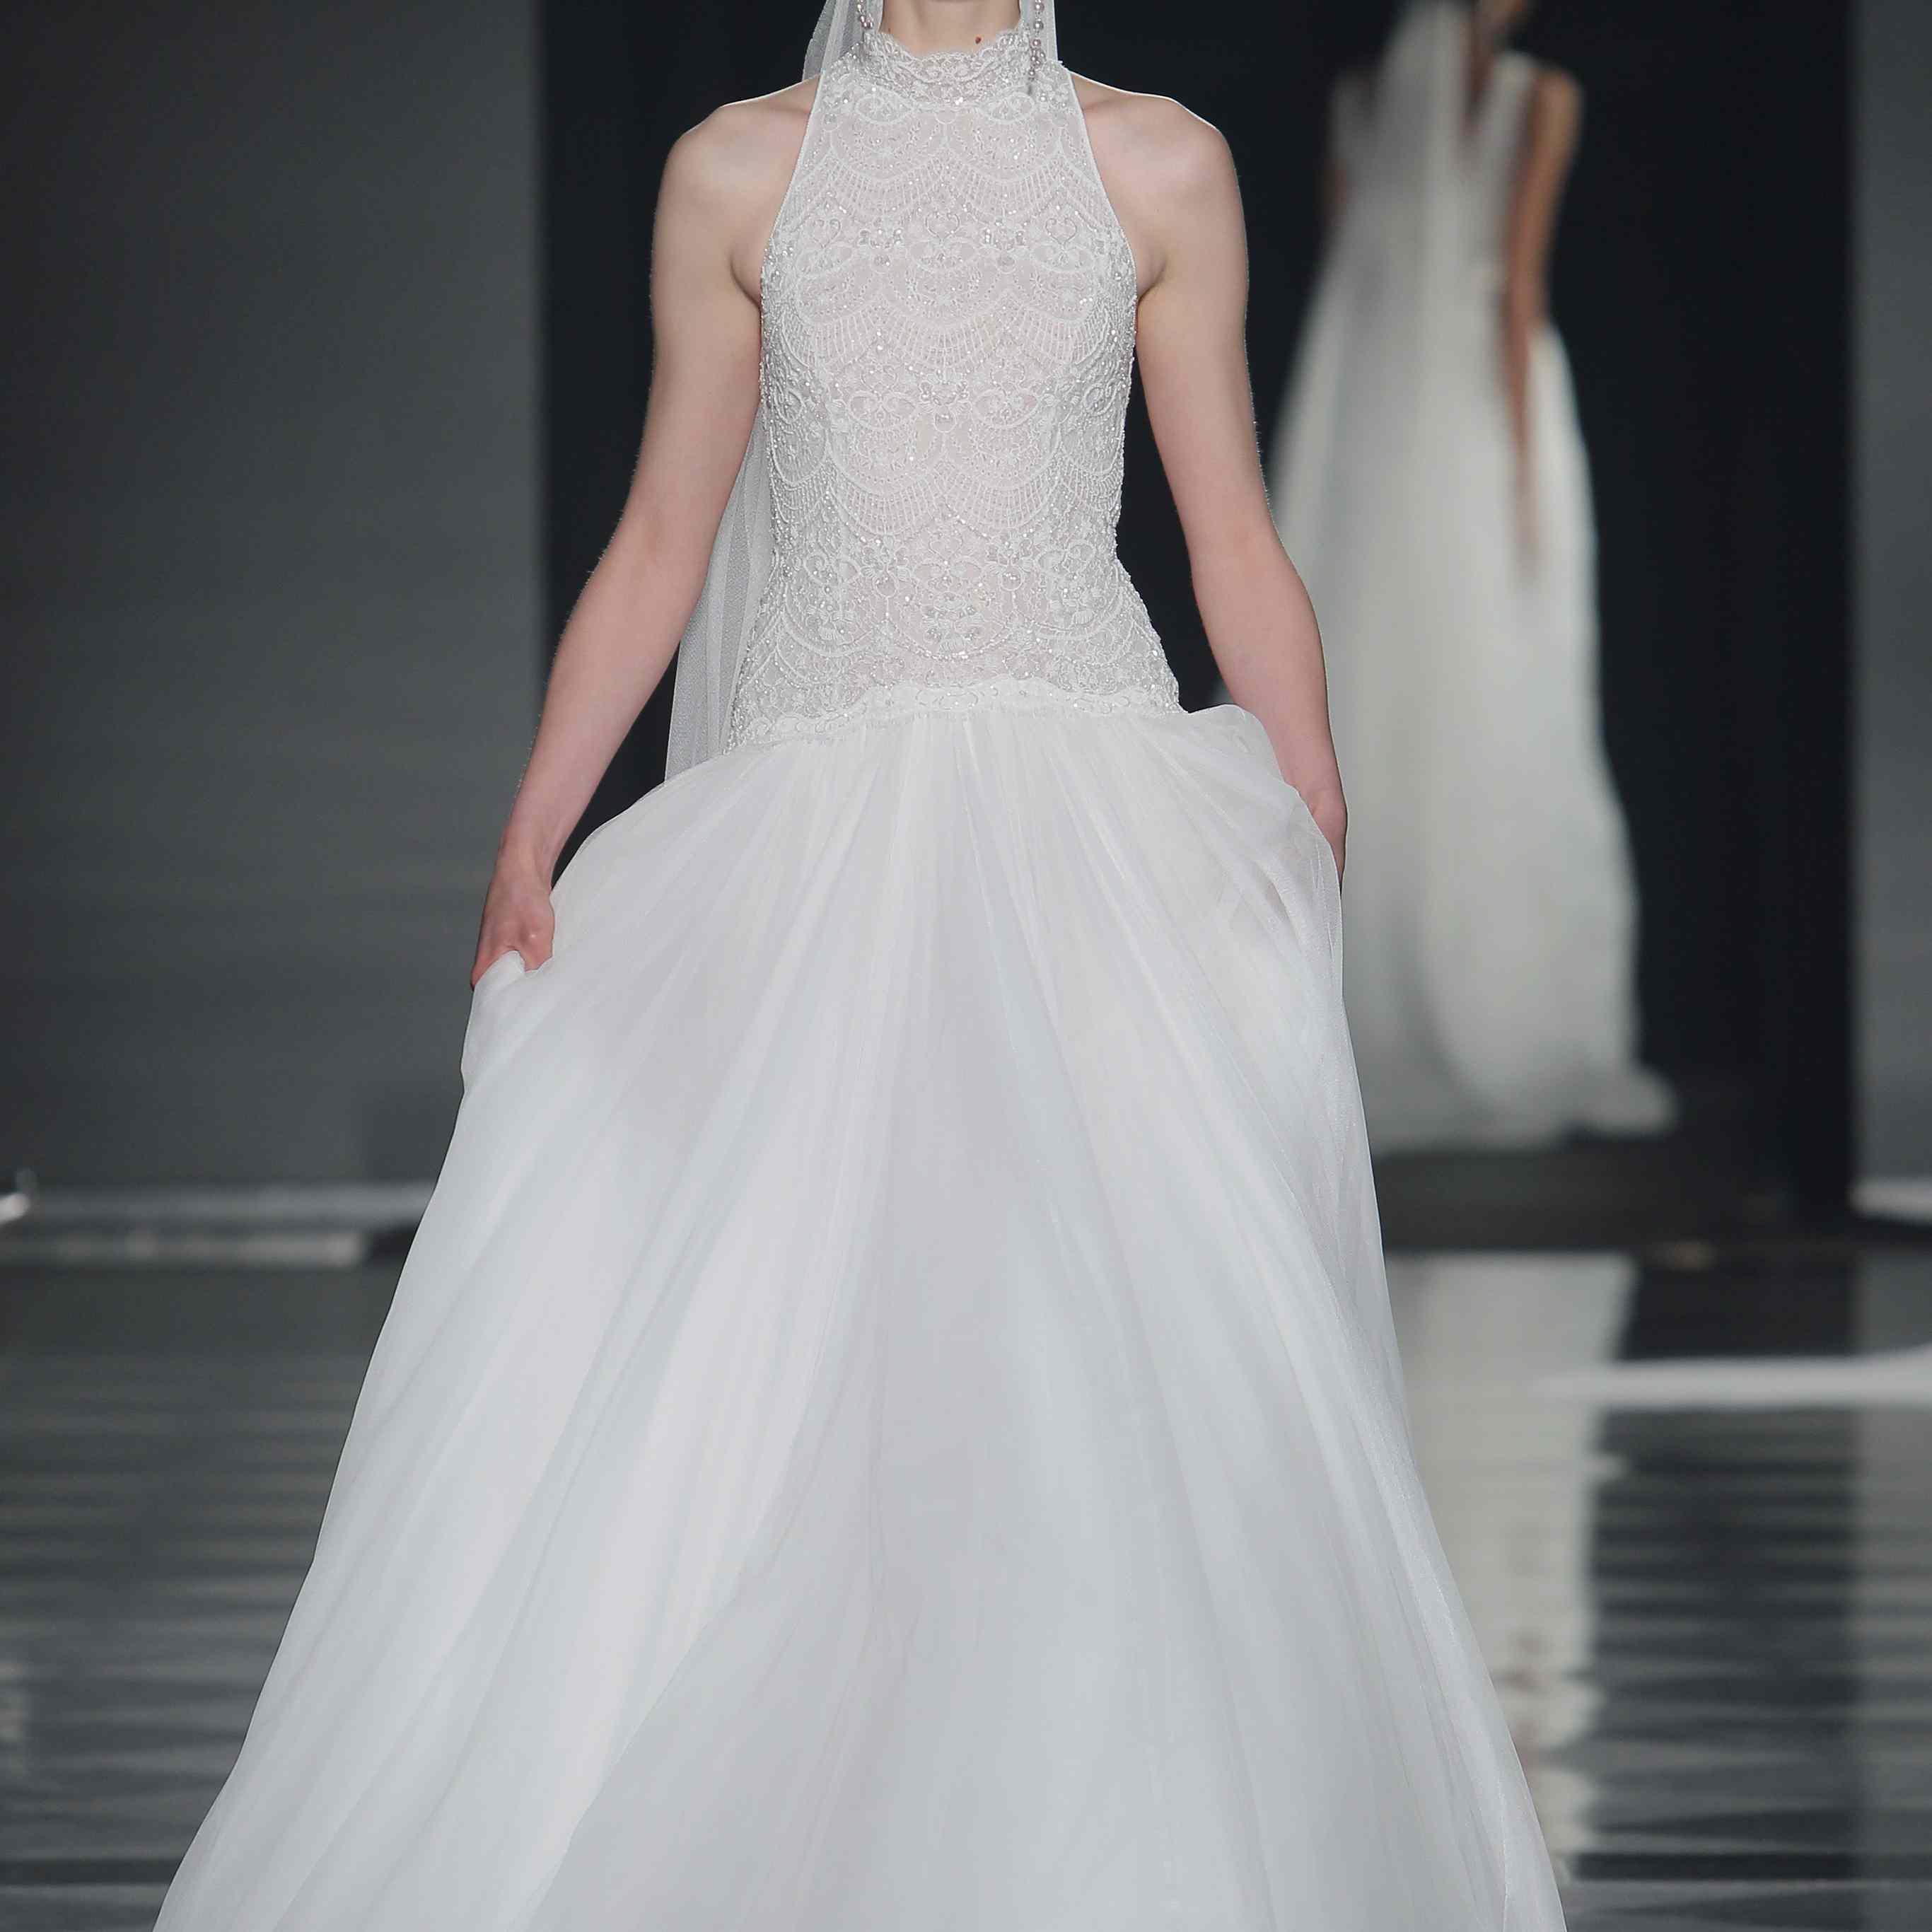 Designer Pakistani Wedding Dresses 2015 Goldin Ma